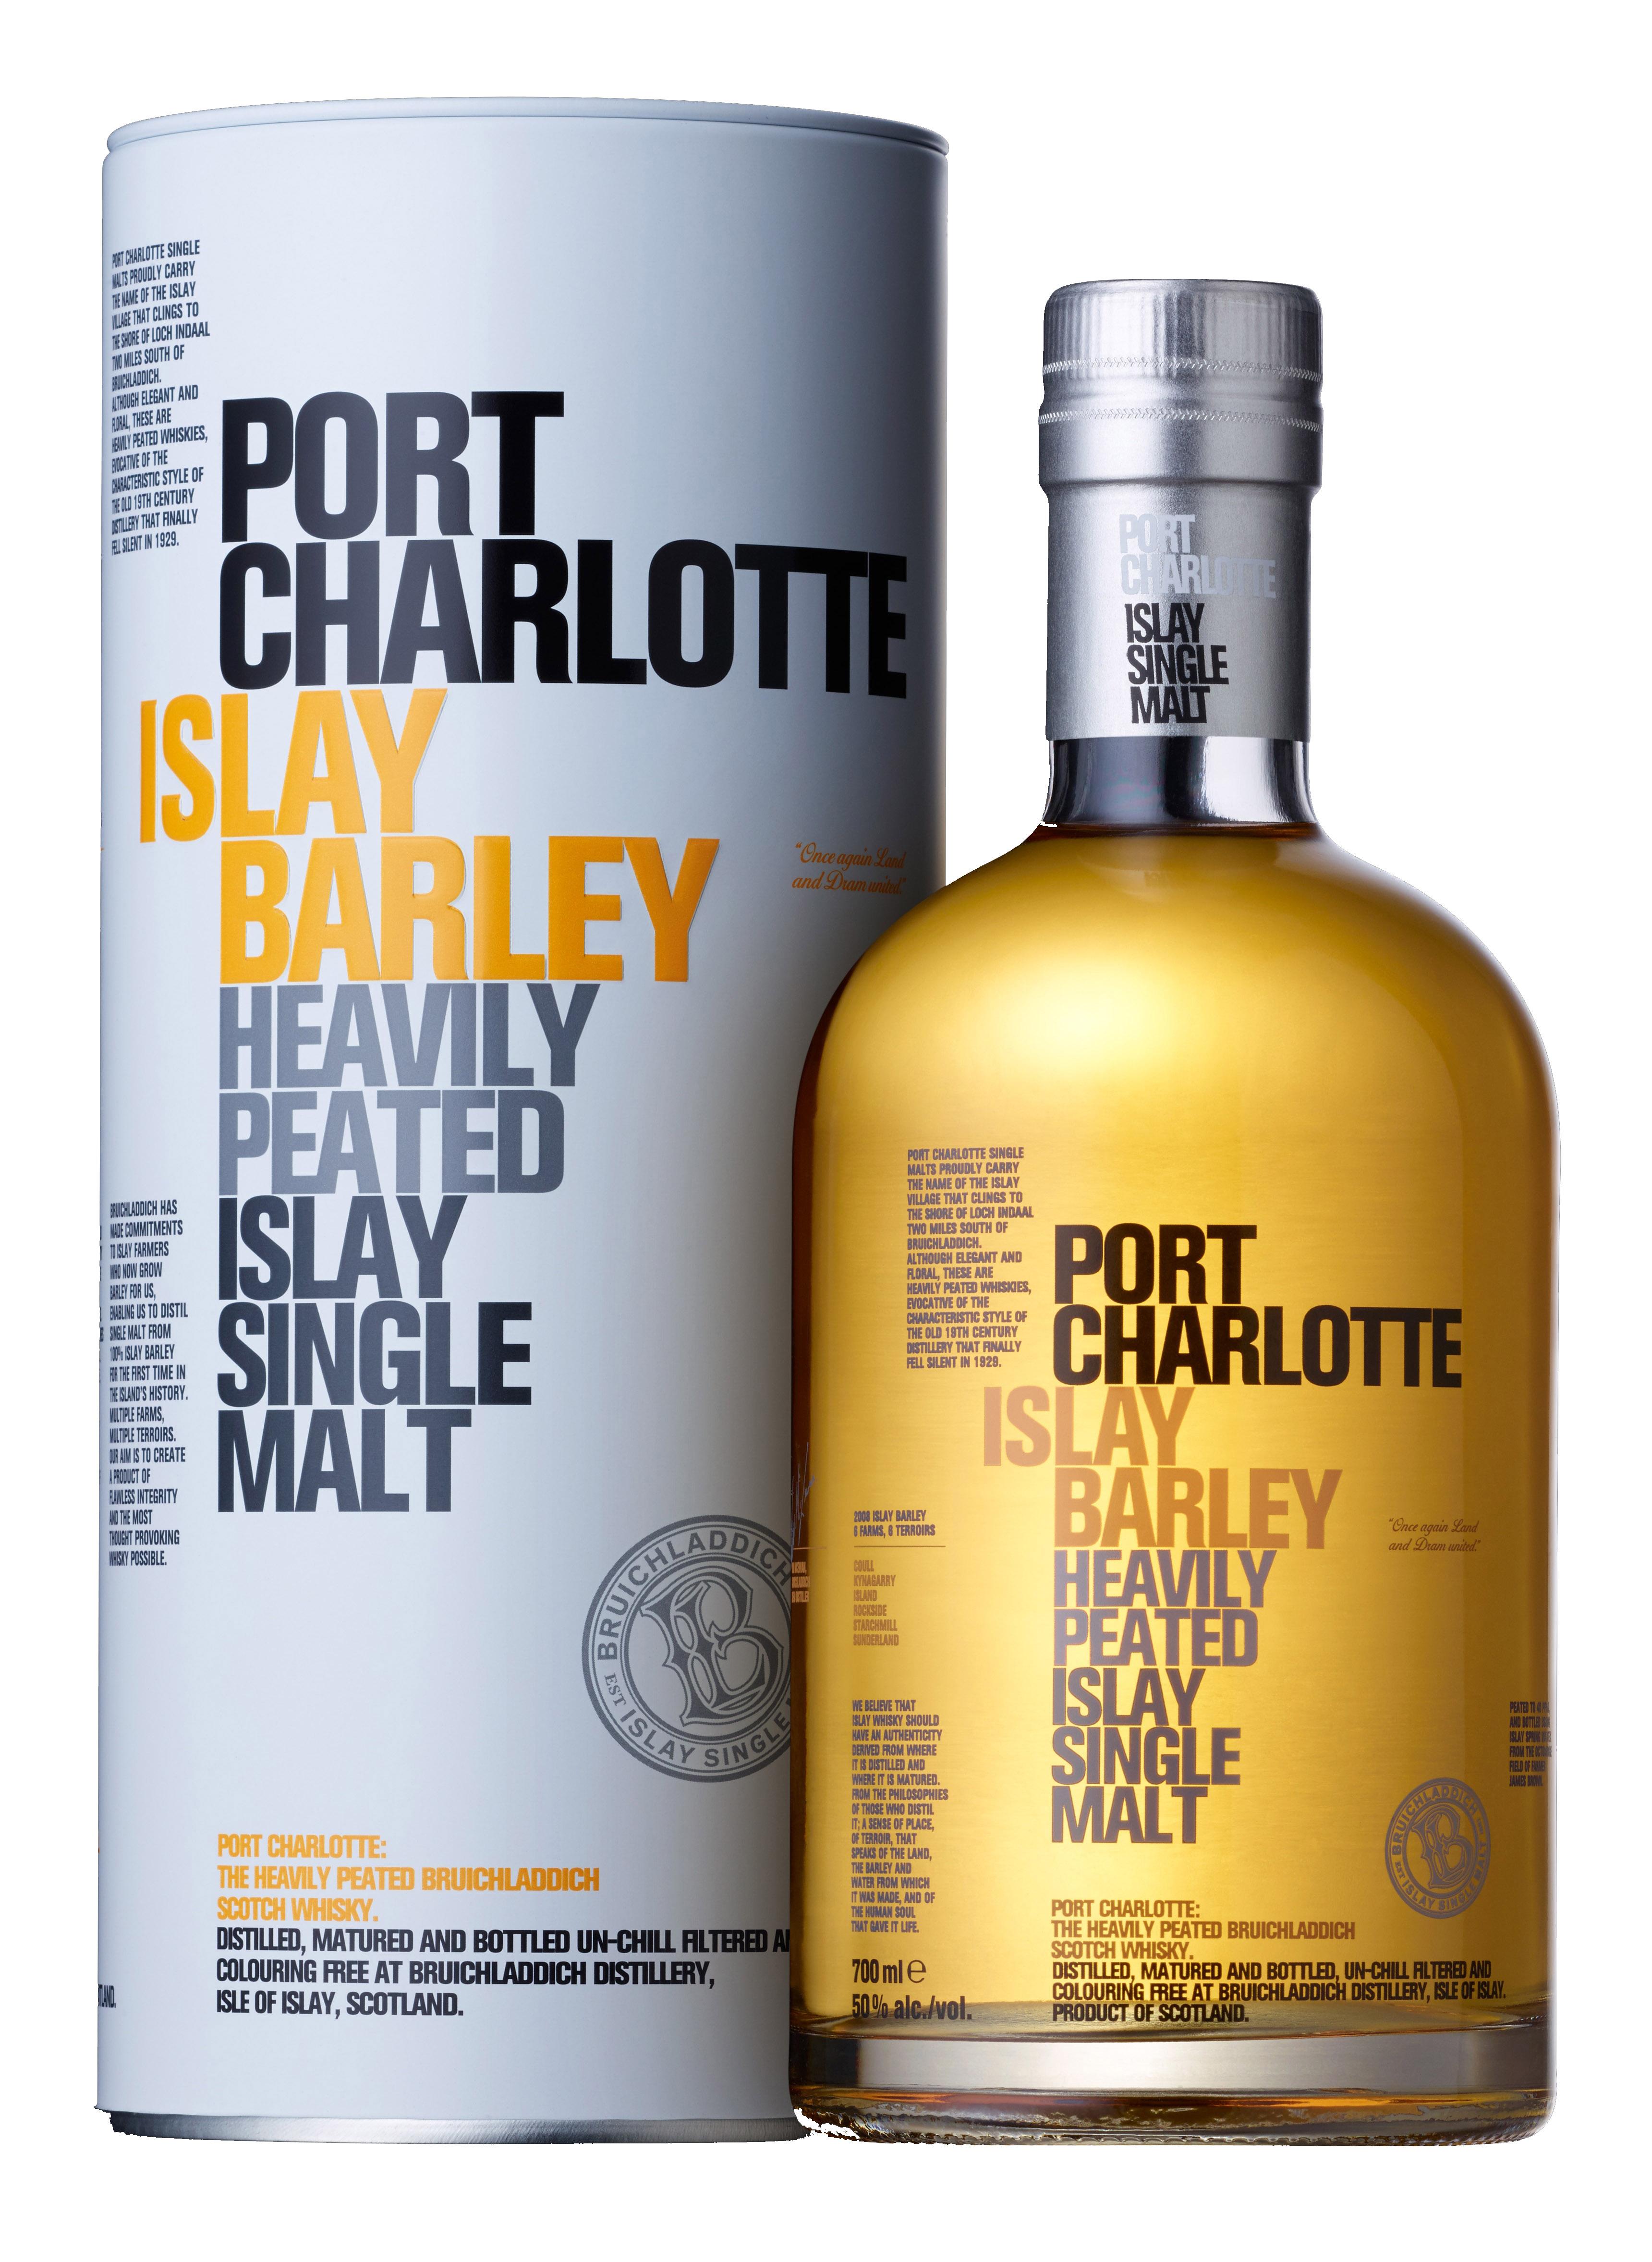 Review port charlotte islay barley swb somerset whisky blog - Bruichladdich port charlotte ...